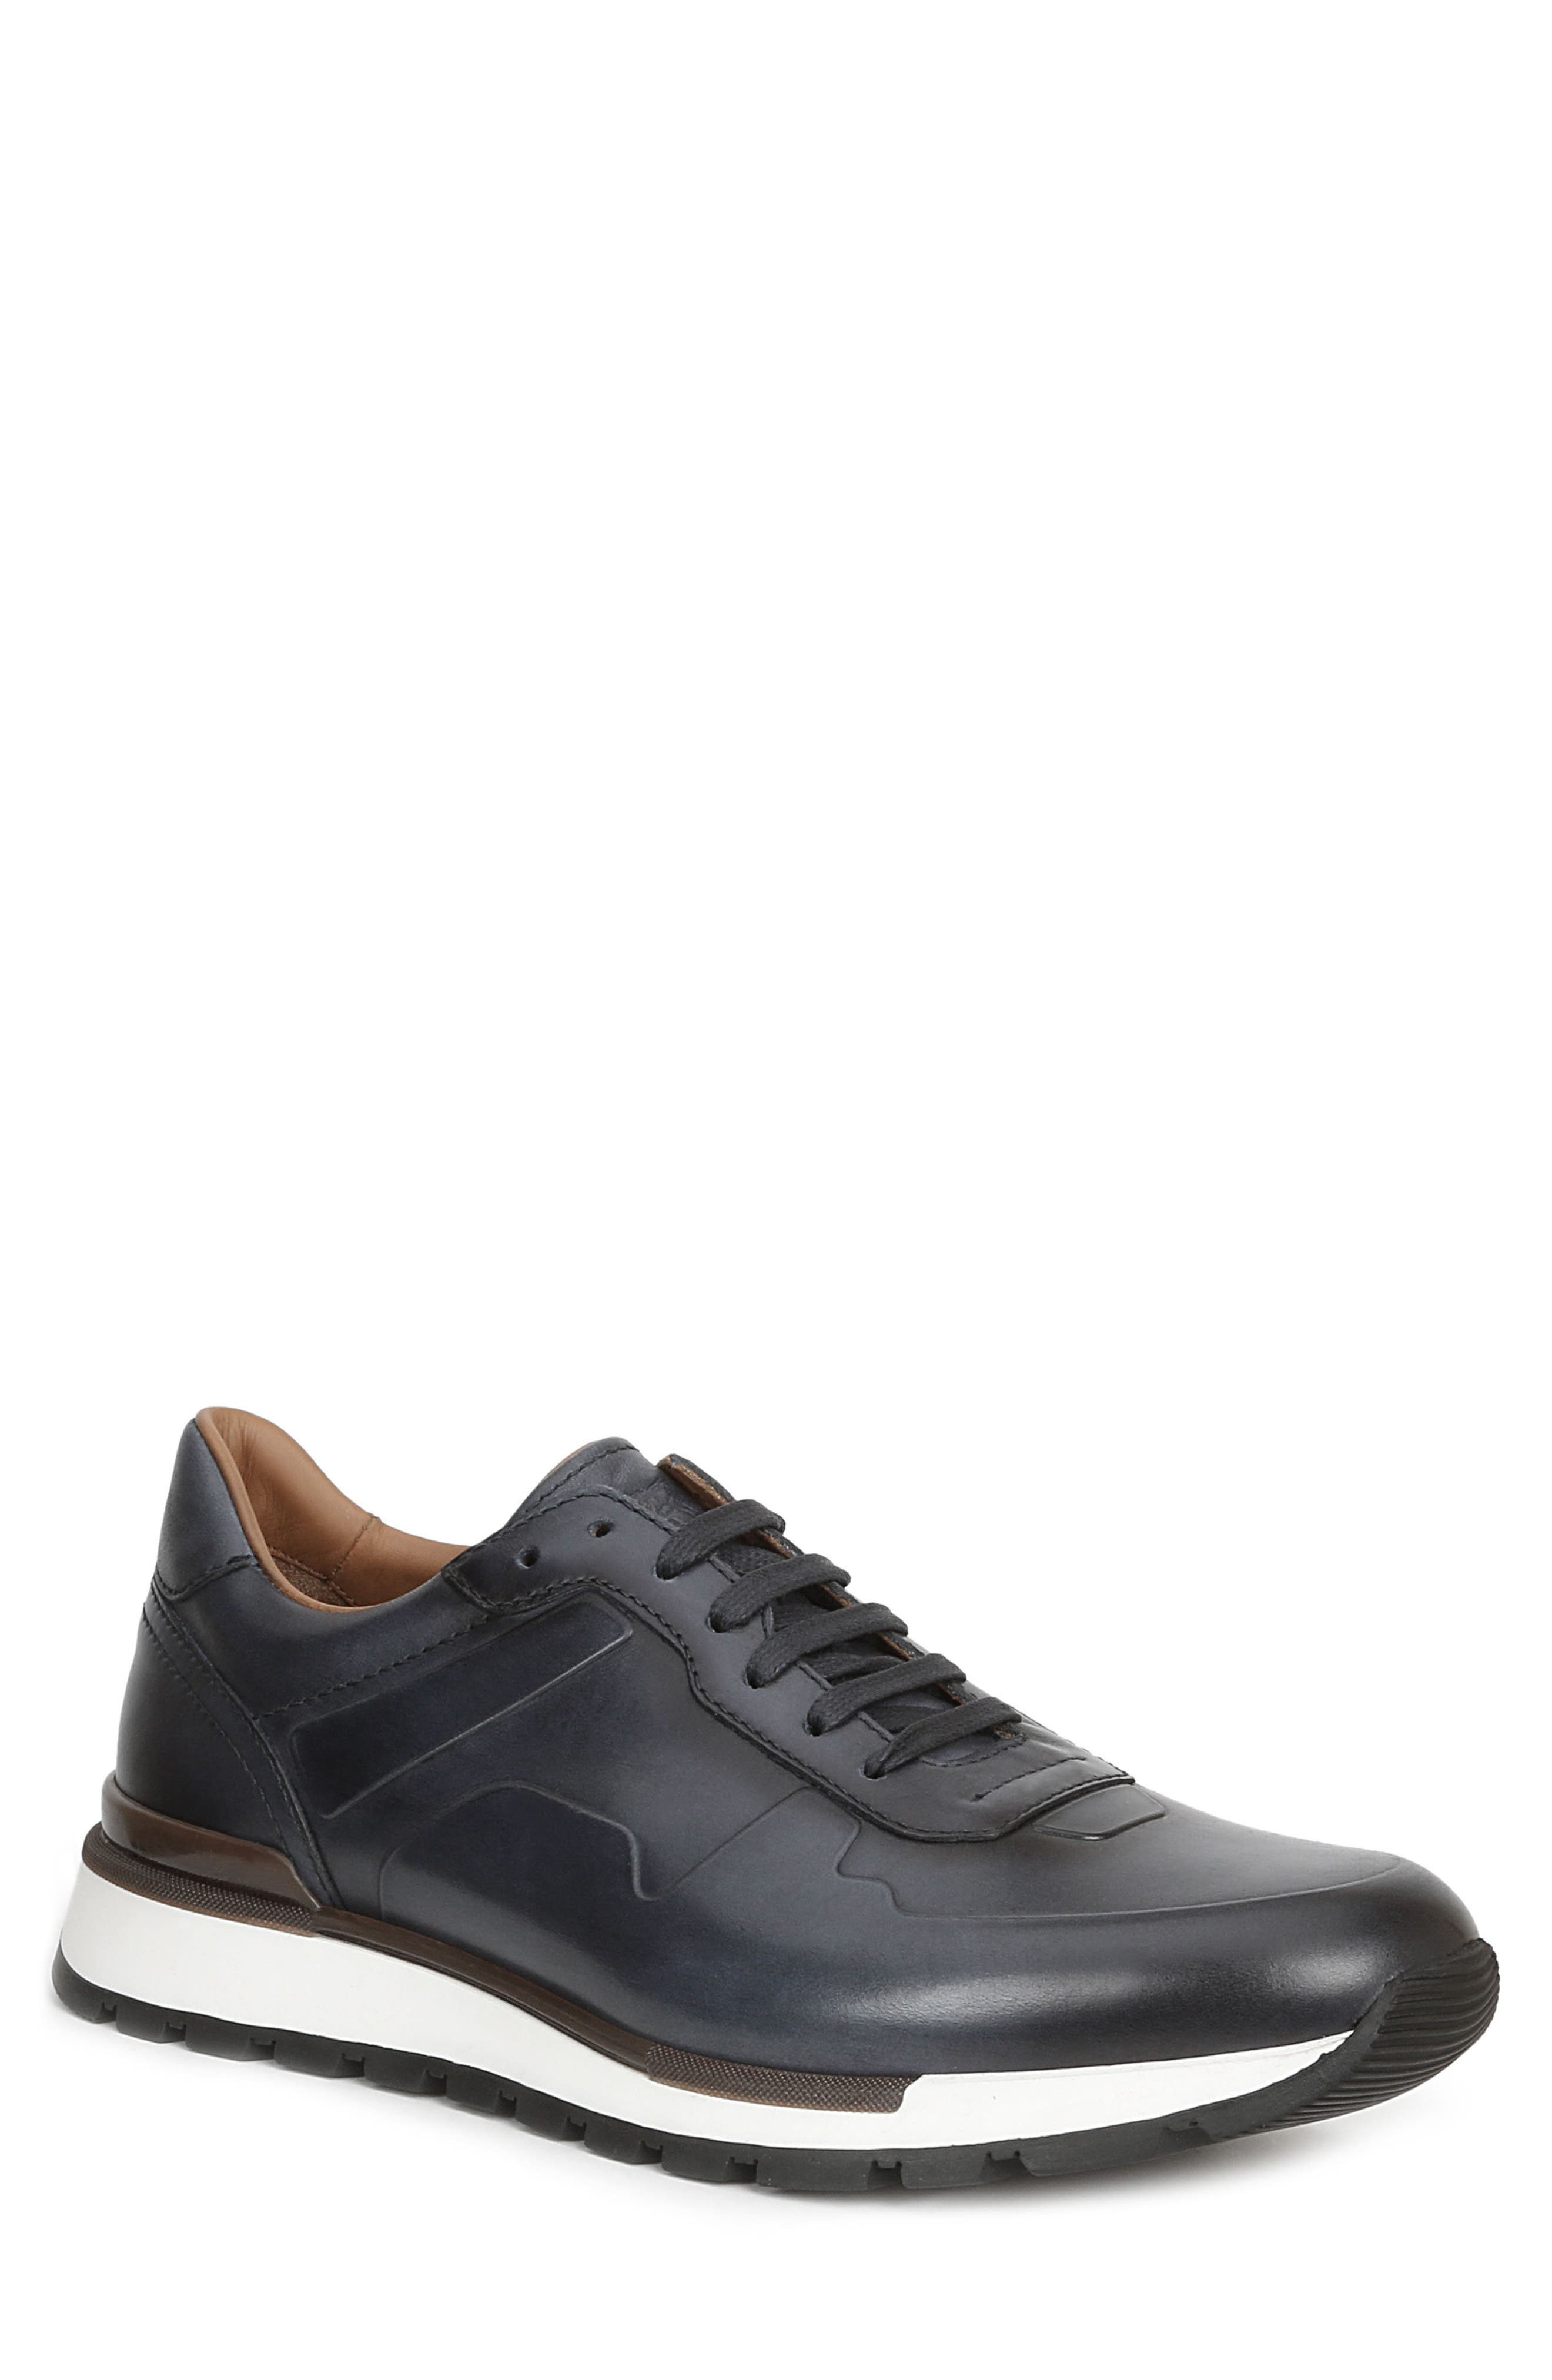 Davio Low Top Sneaker,                         Main,                         color, Navy